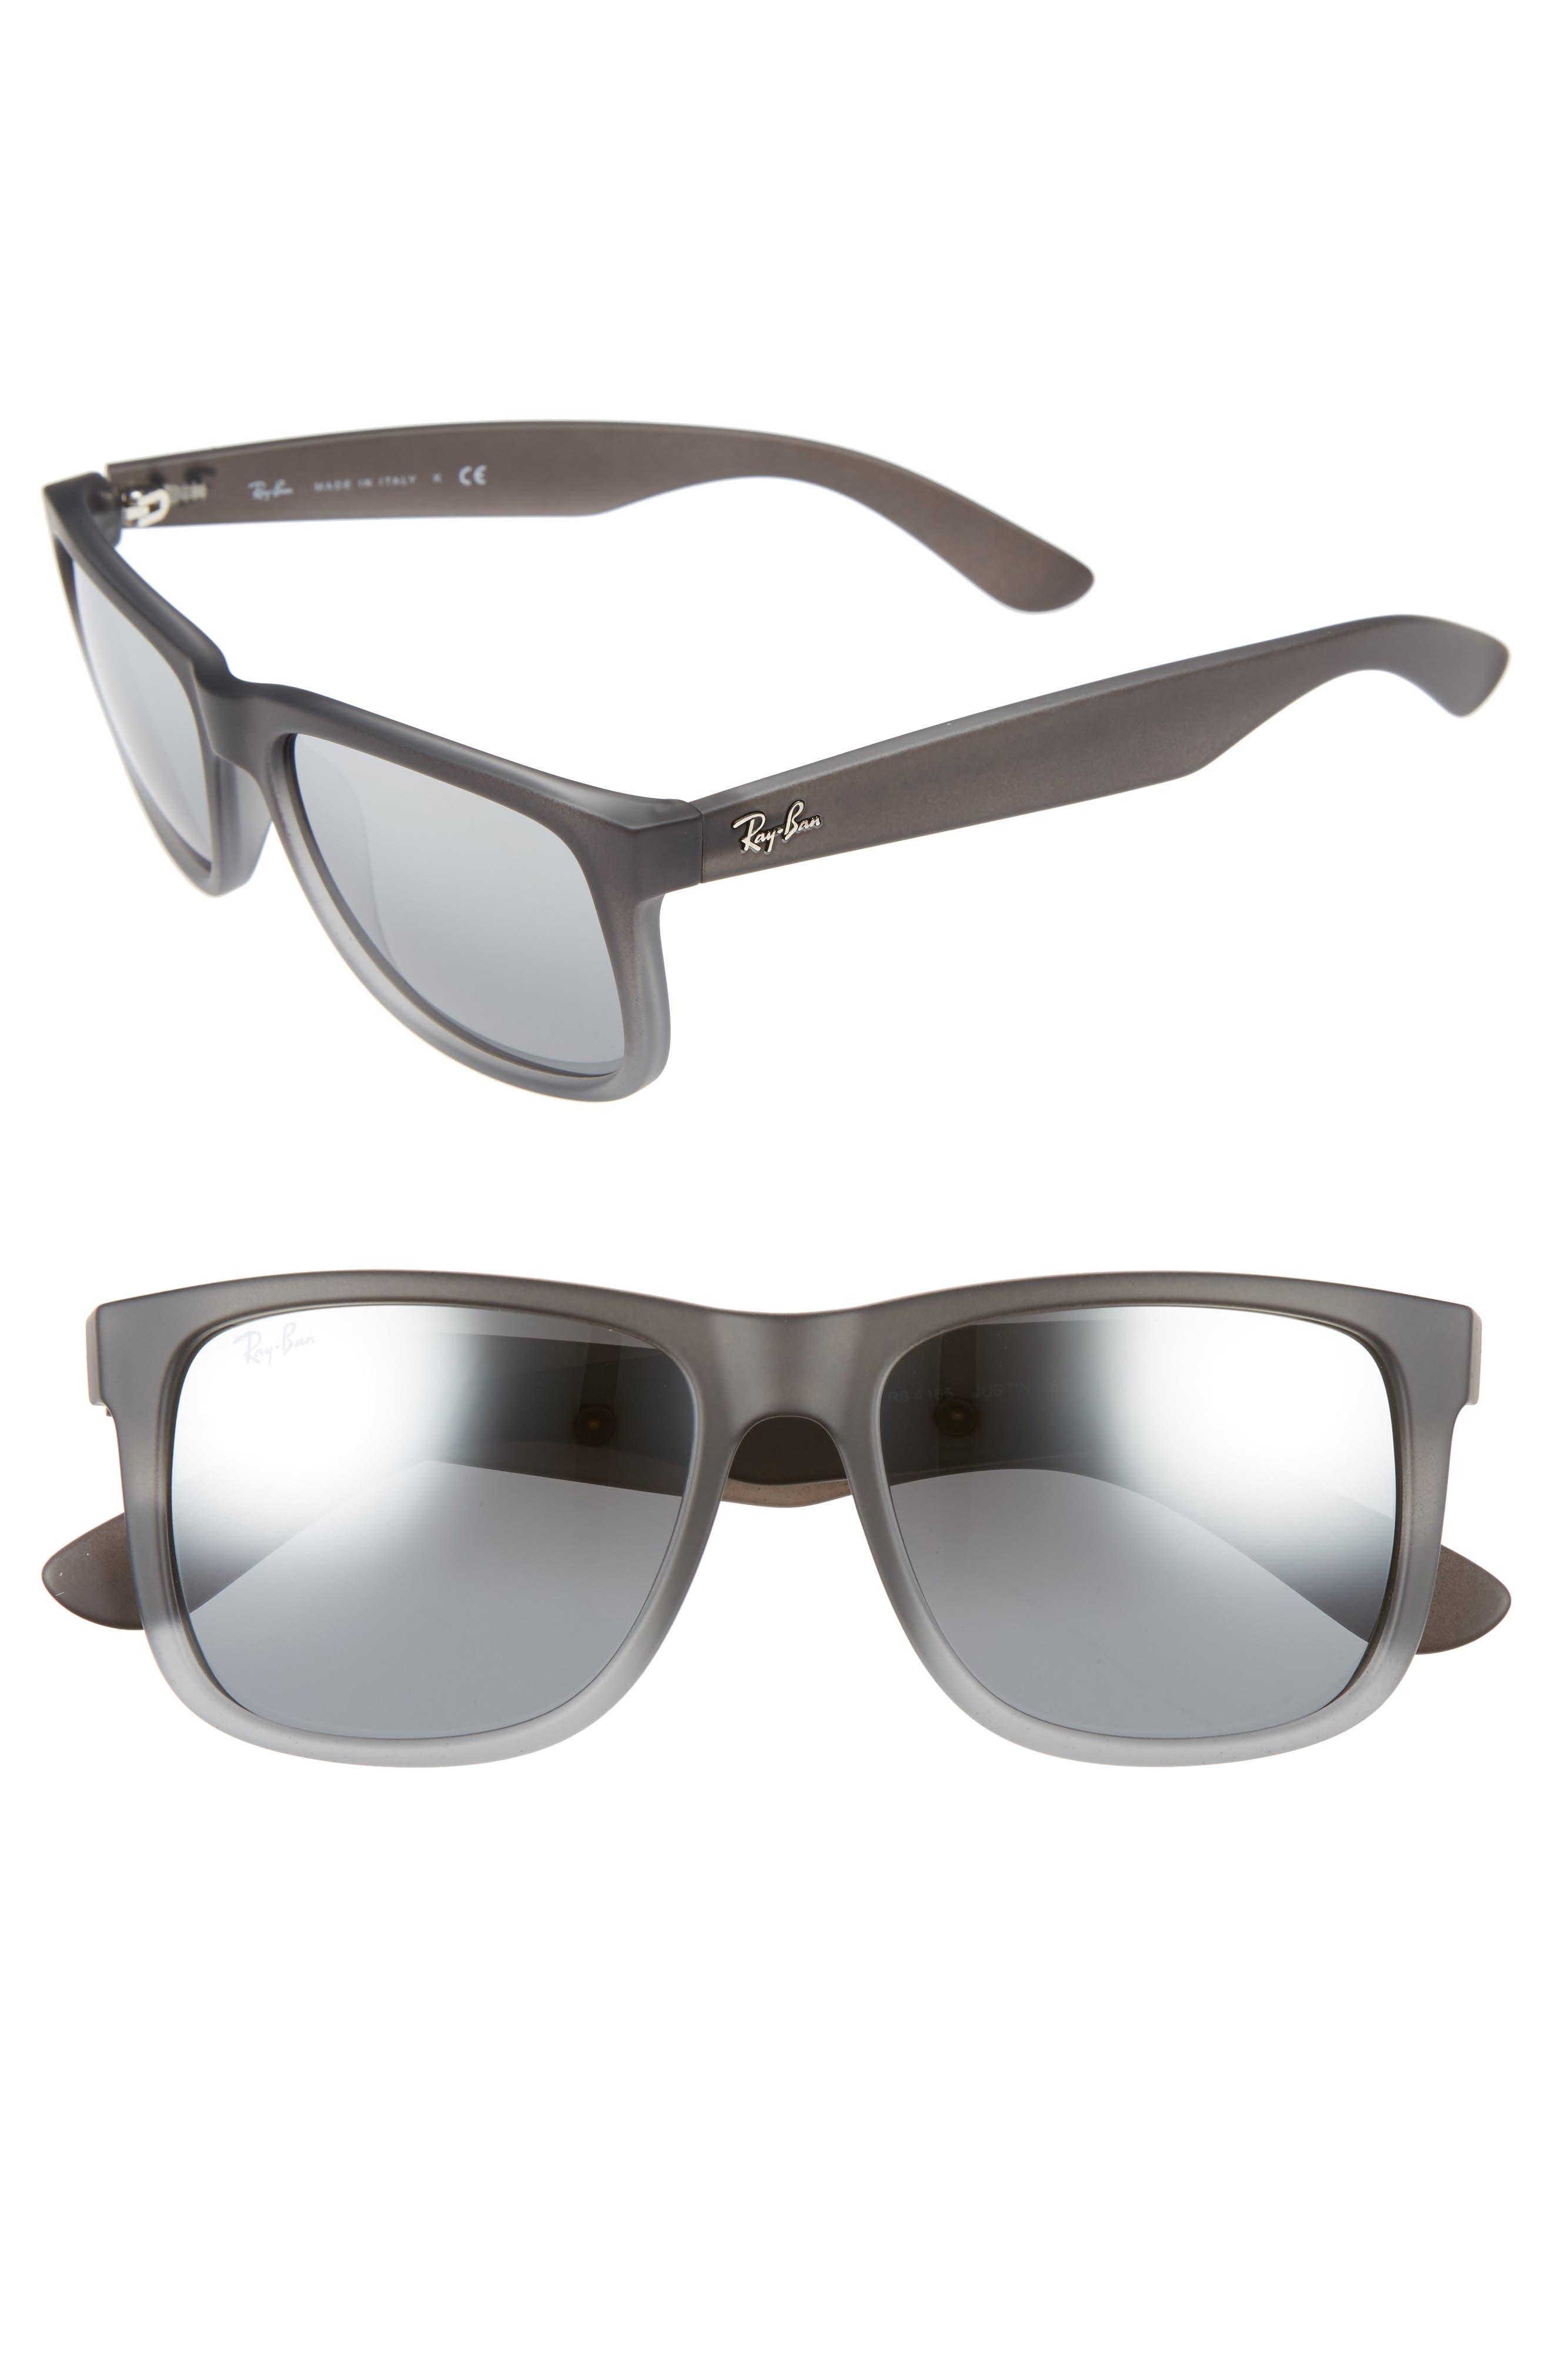 Ray-Ban 5m Sunglasses - Black/ Grey Gradient